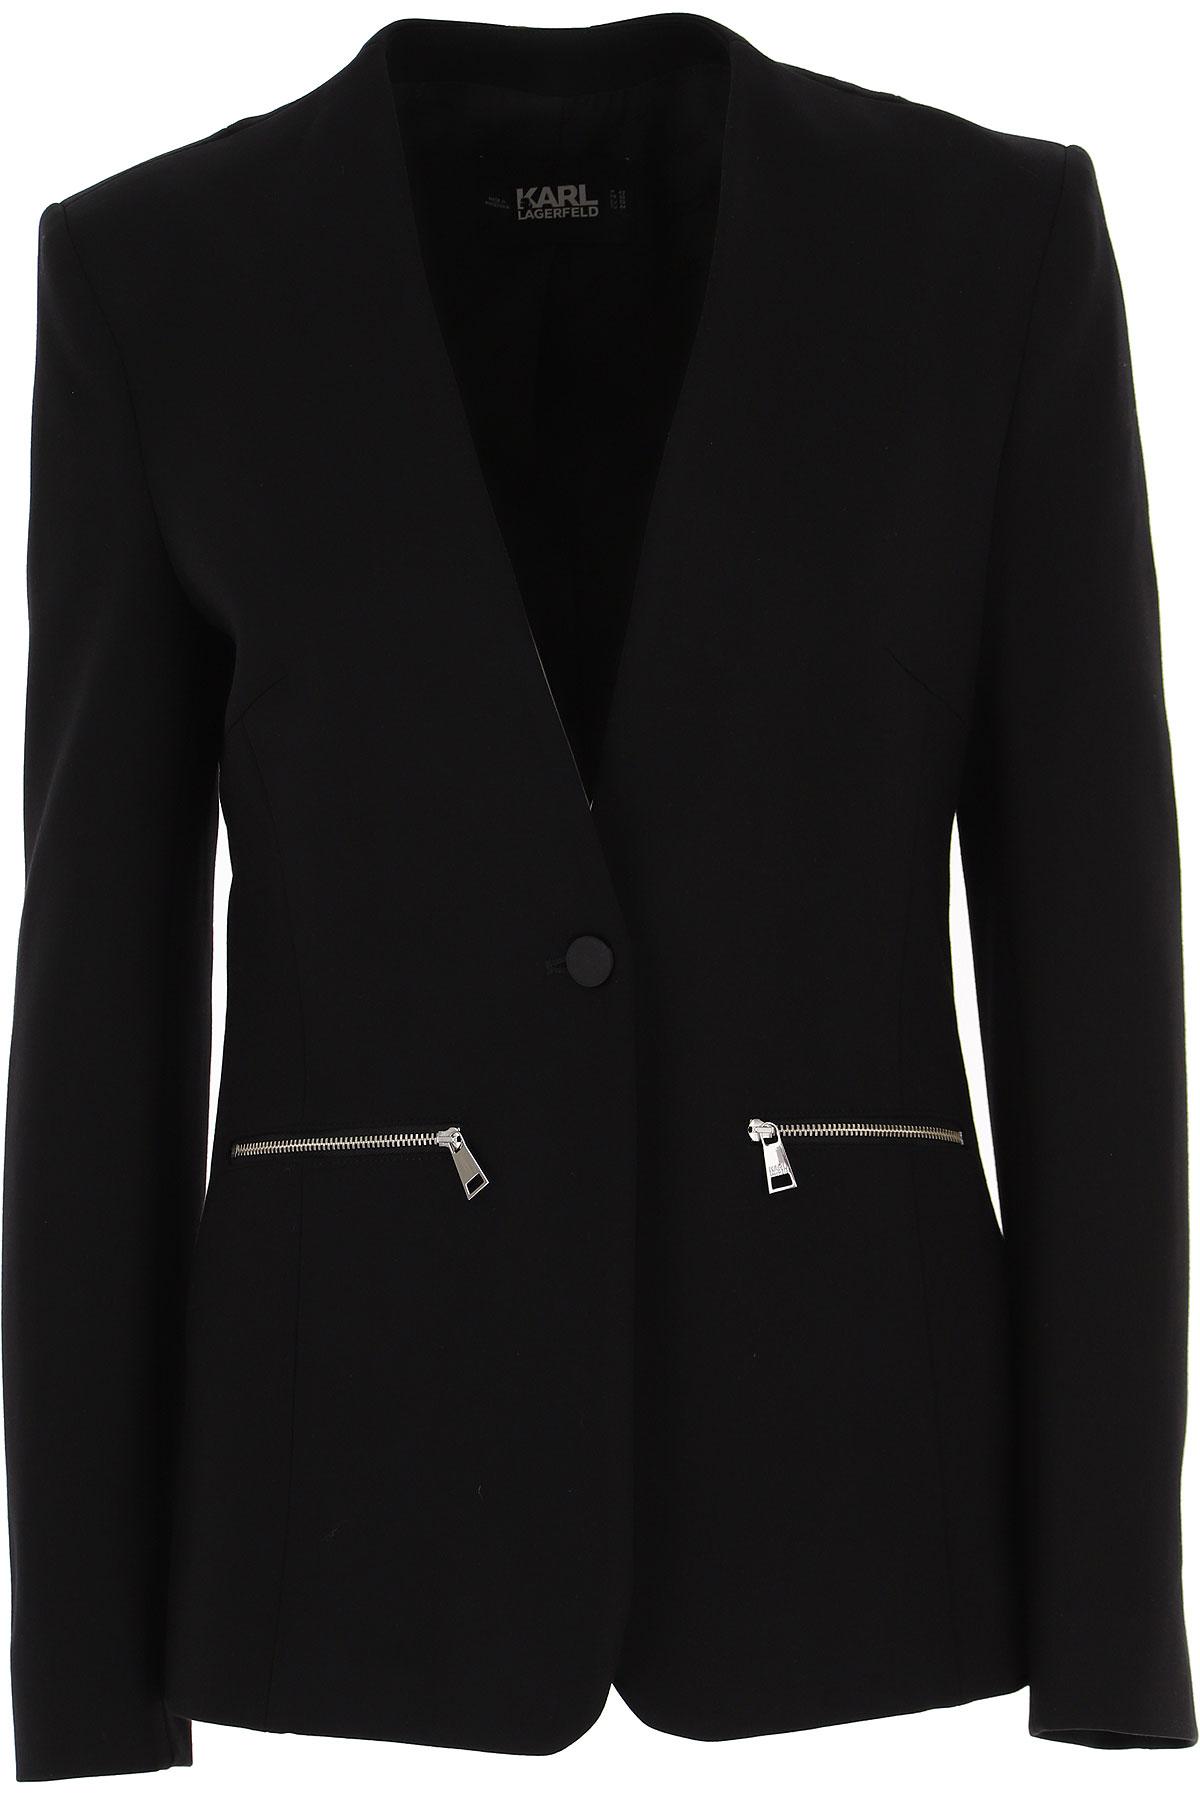 Karl Lagerfeld Blazer for Women On Sale, Black, Viscose, 2019, 10 6 8